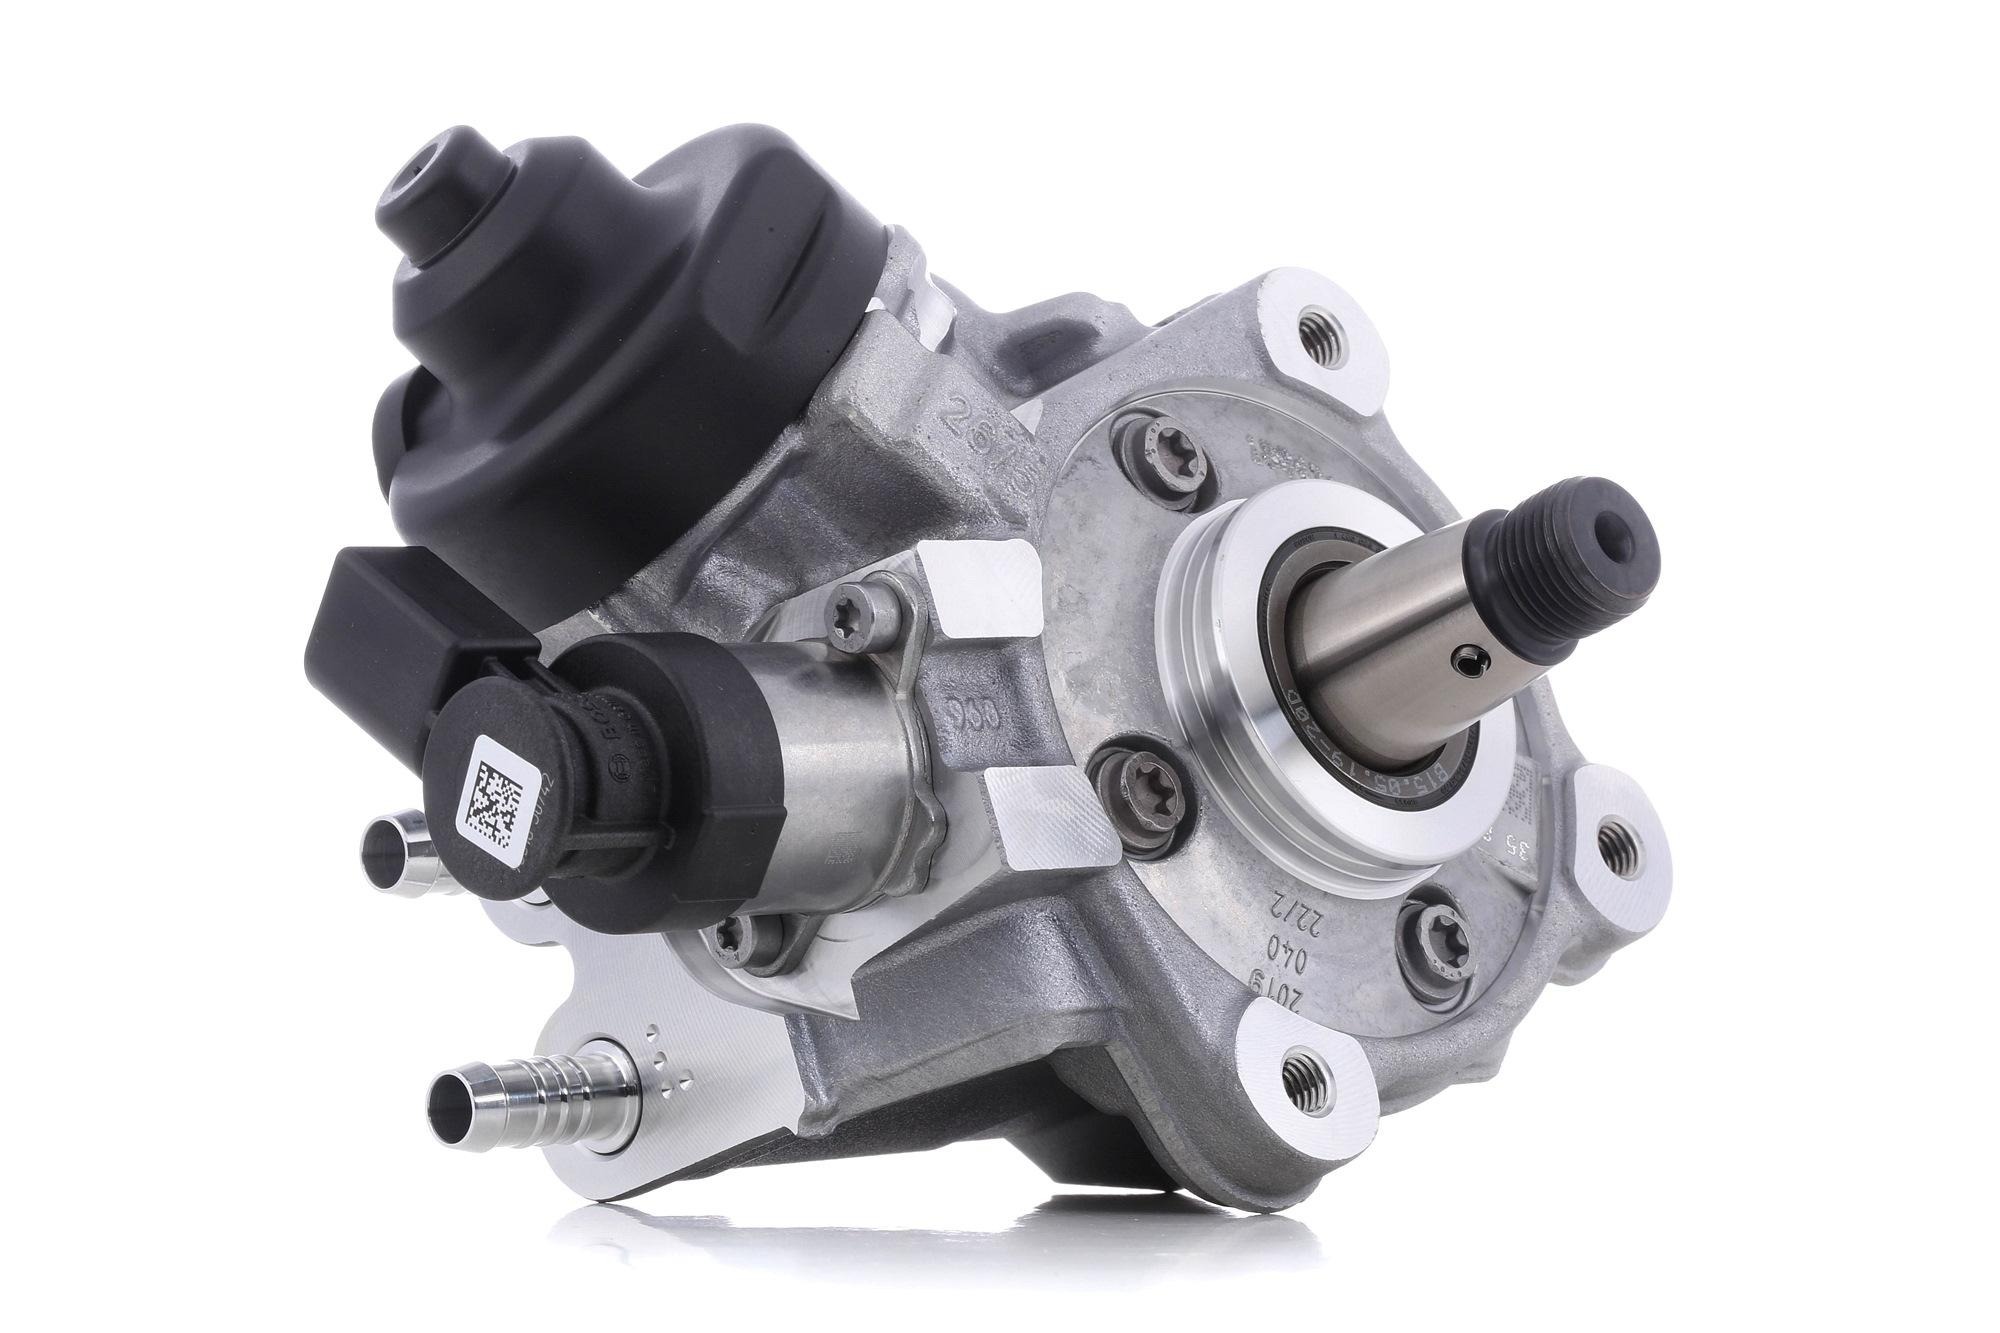 Original Systém prívodu paliva 0 986 437 410 Audi